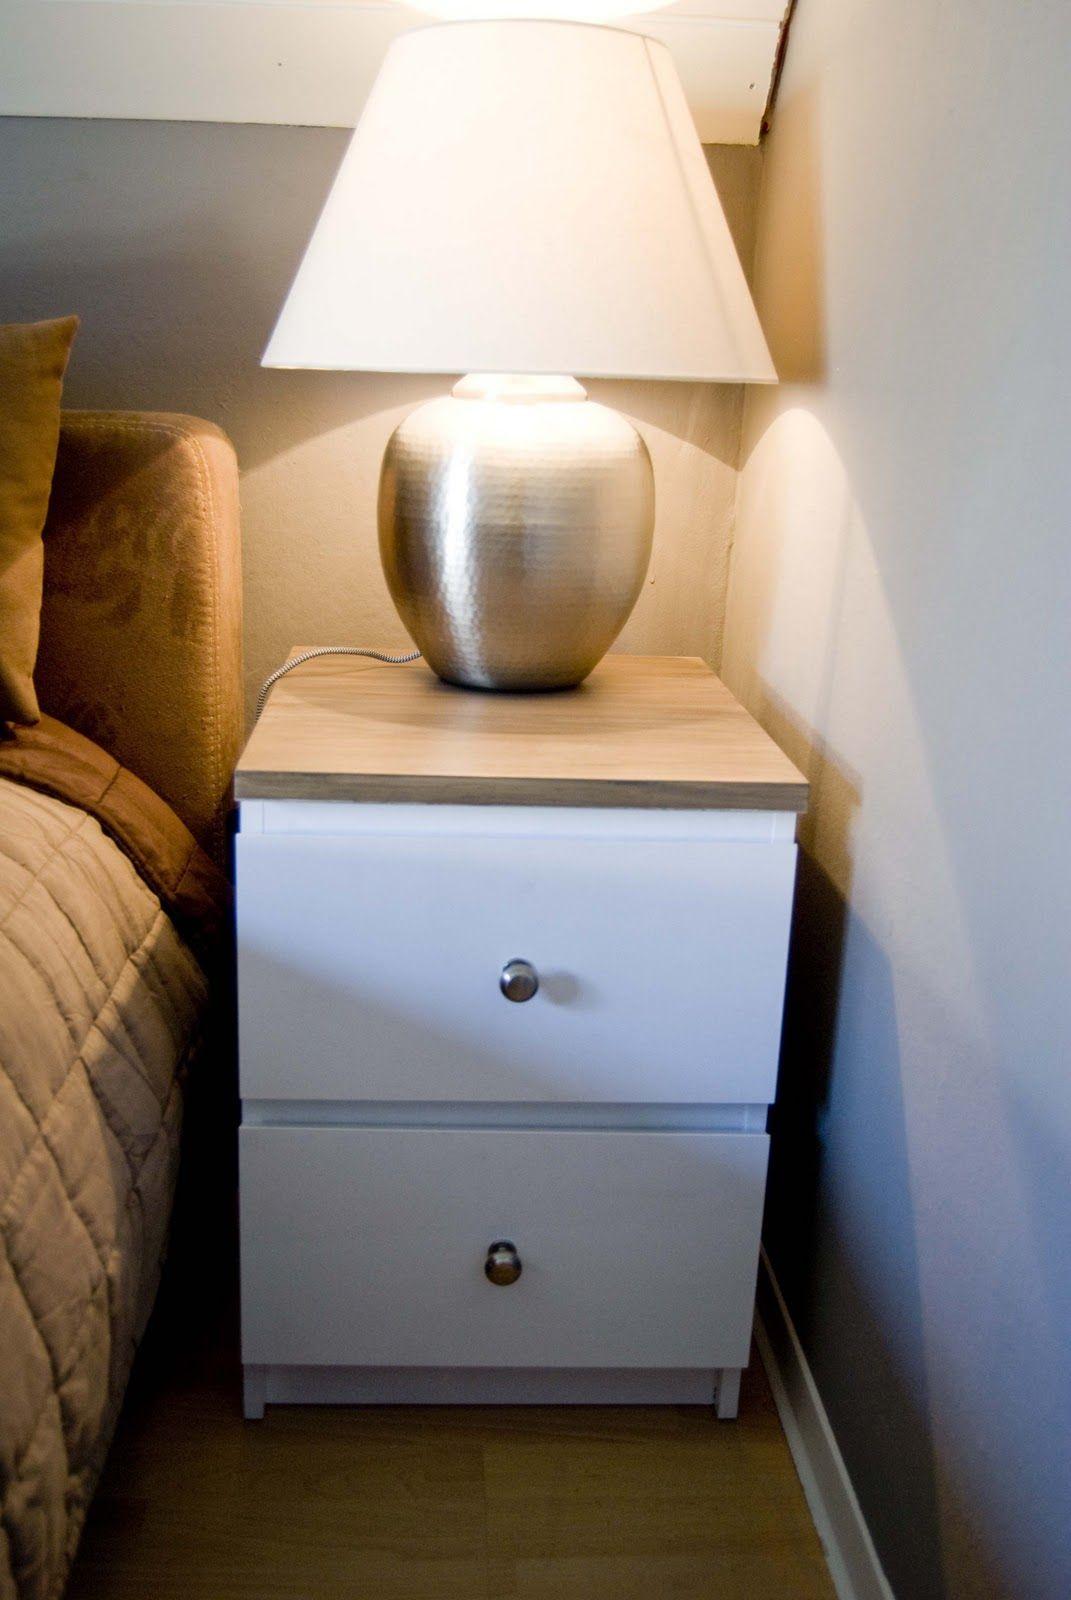 ikea malm nightstand hack | for the home | pinterest - Schlafzimmer Einrichten Ikea Malm